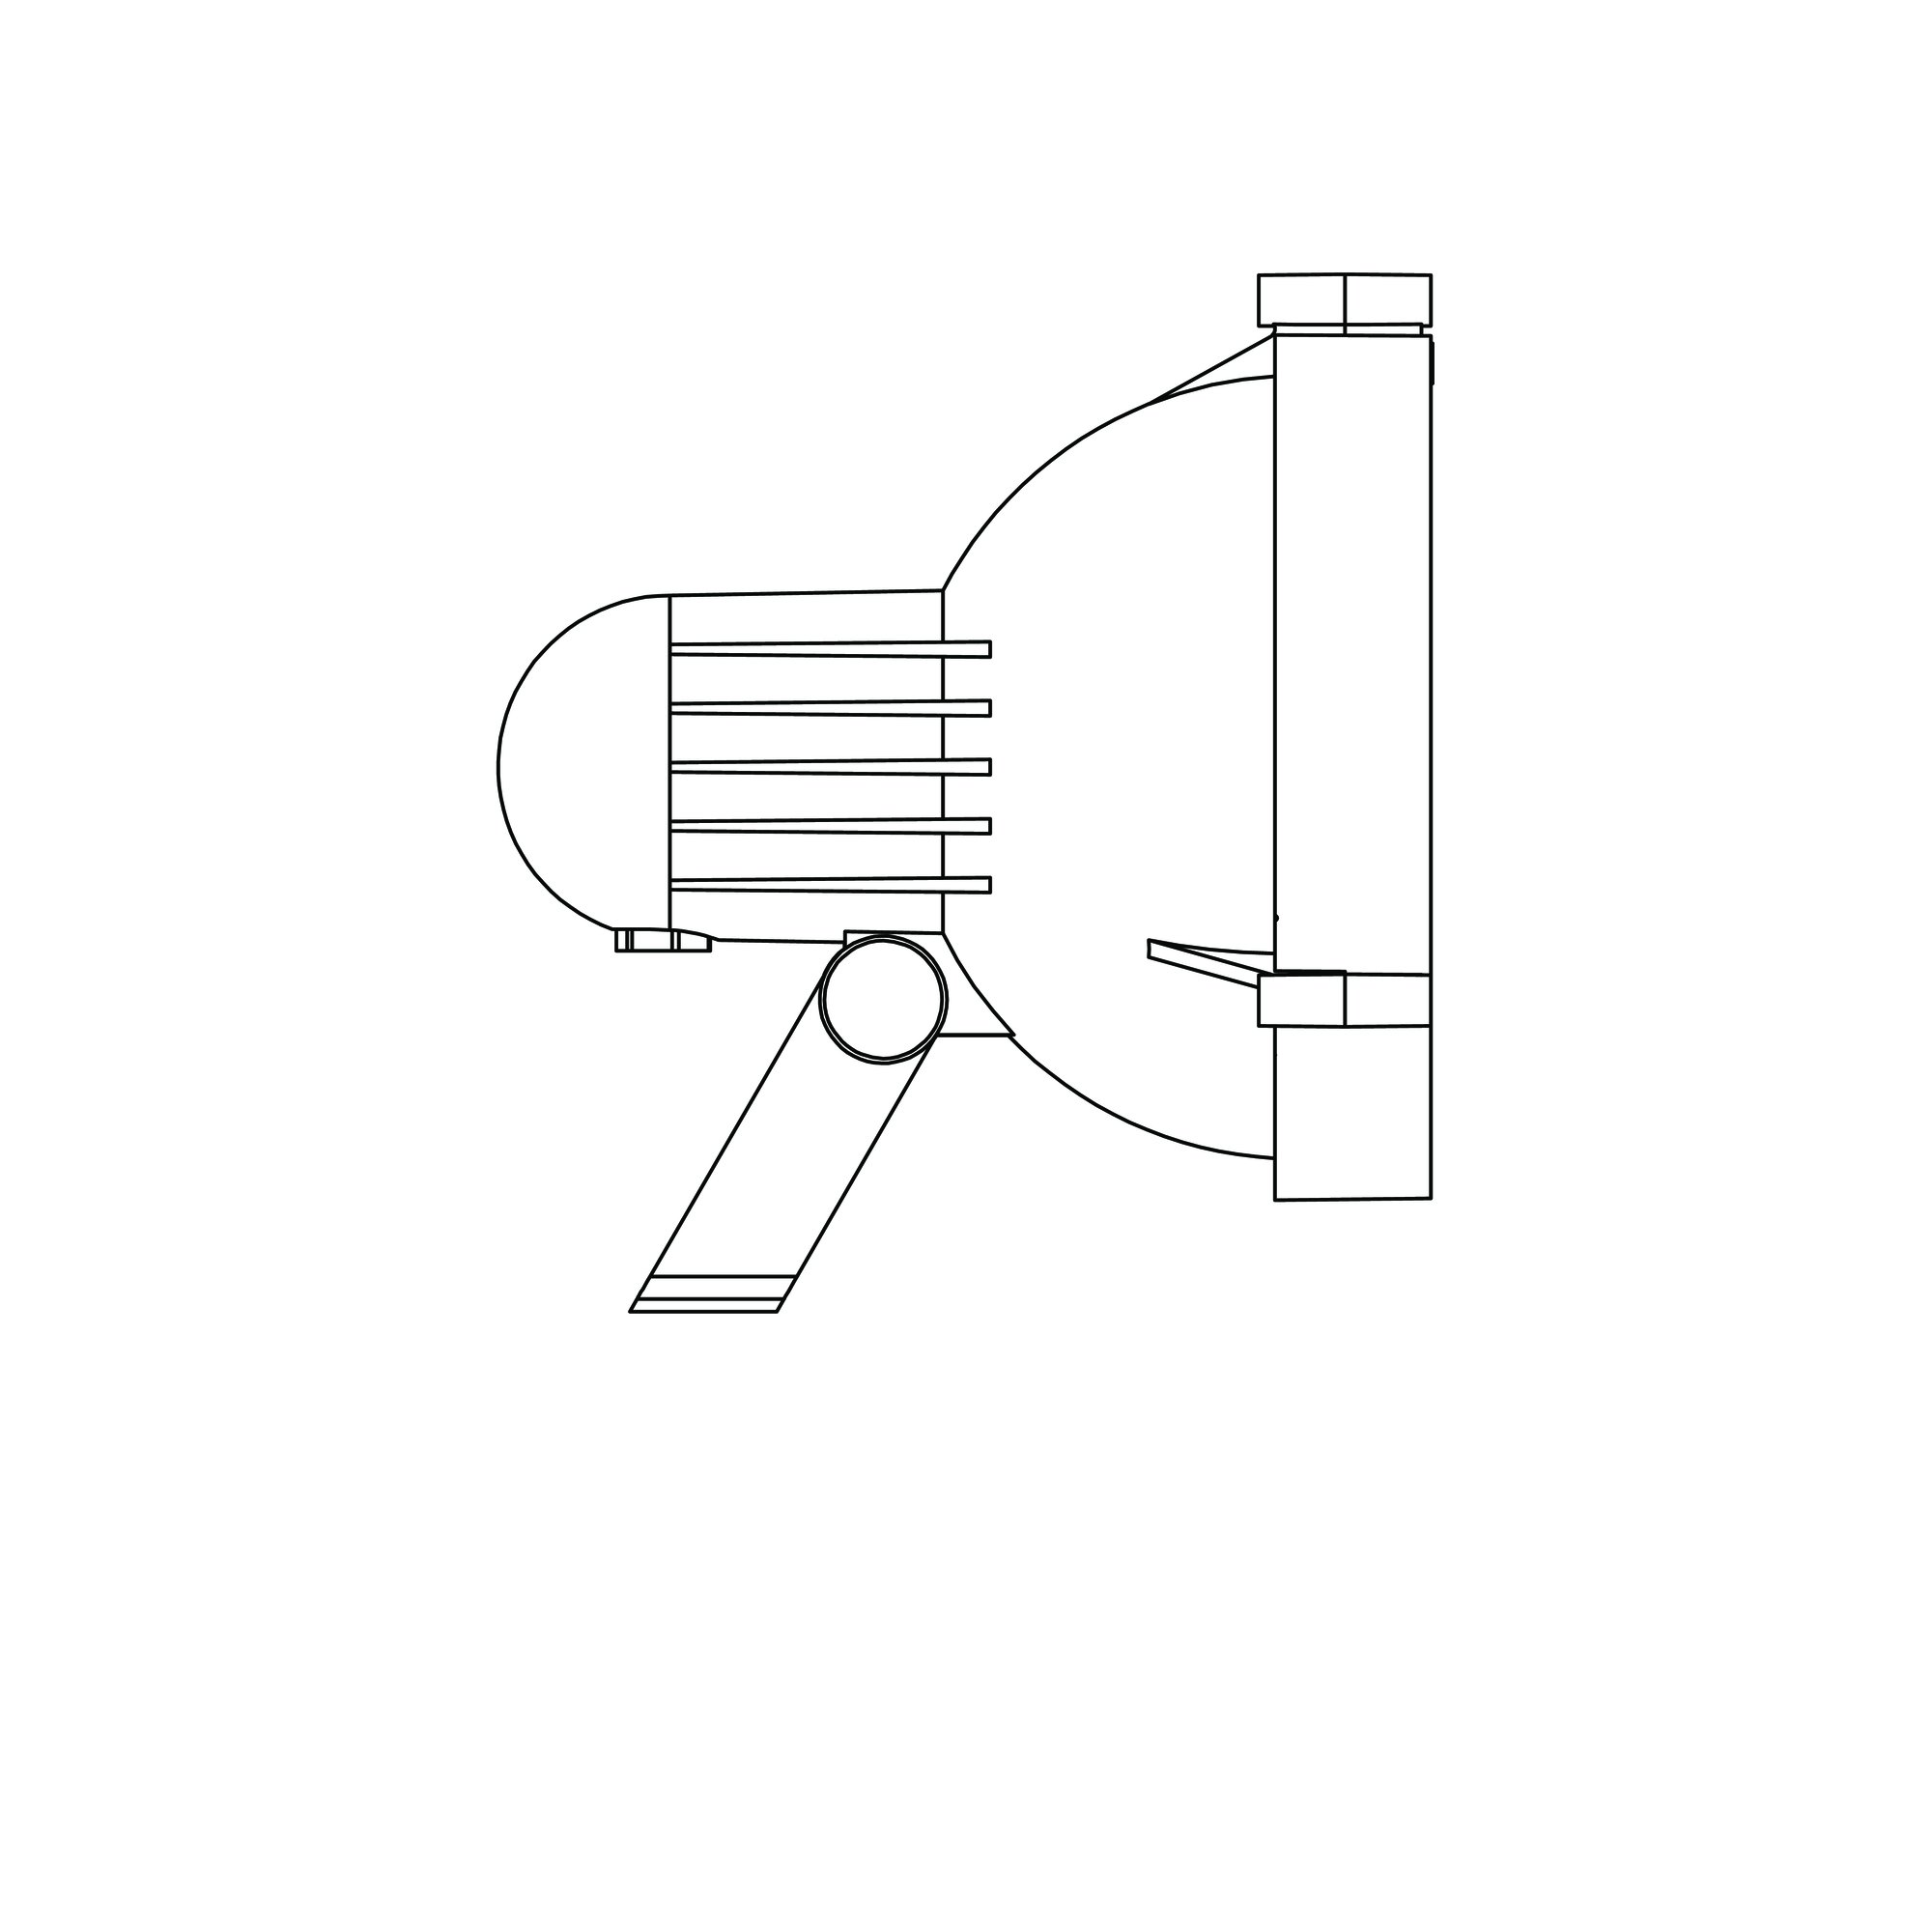 Projector 02